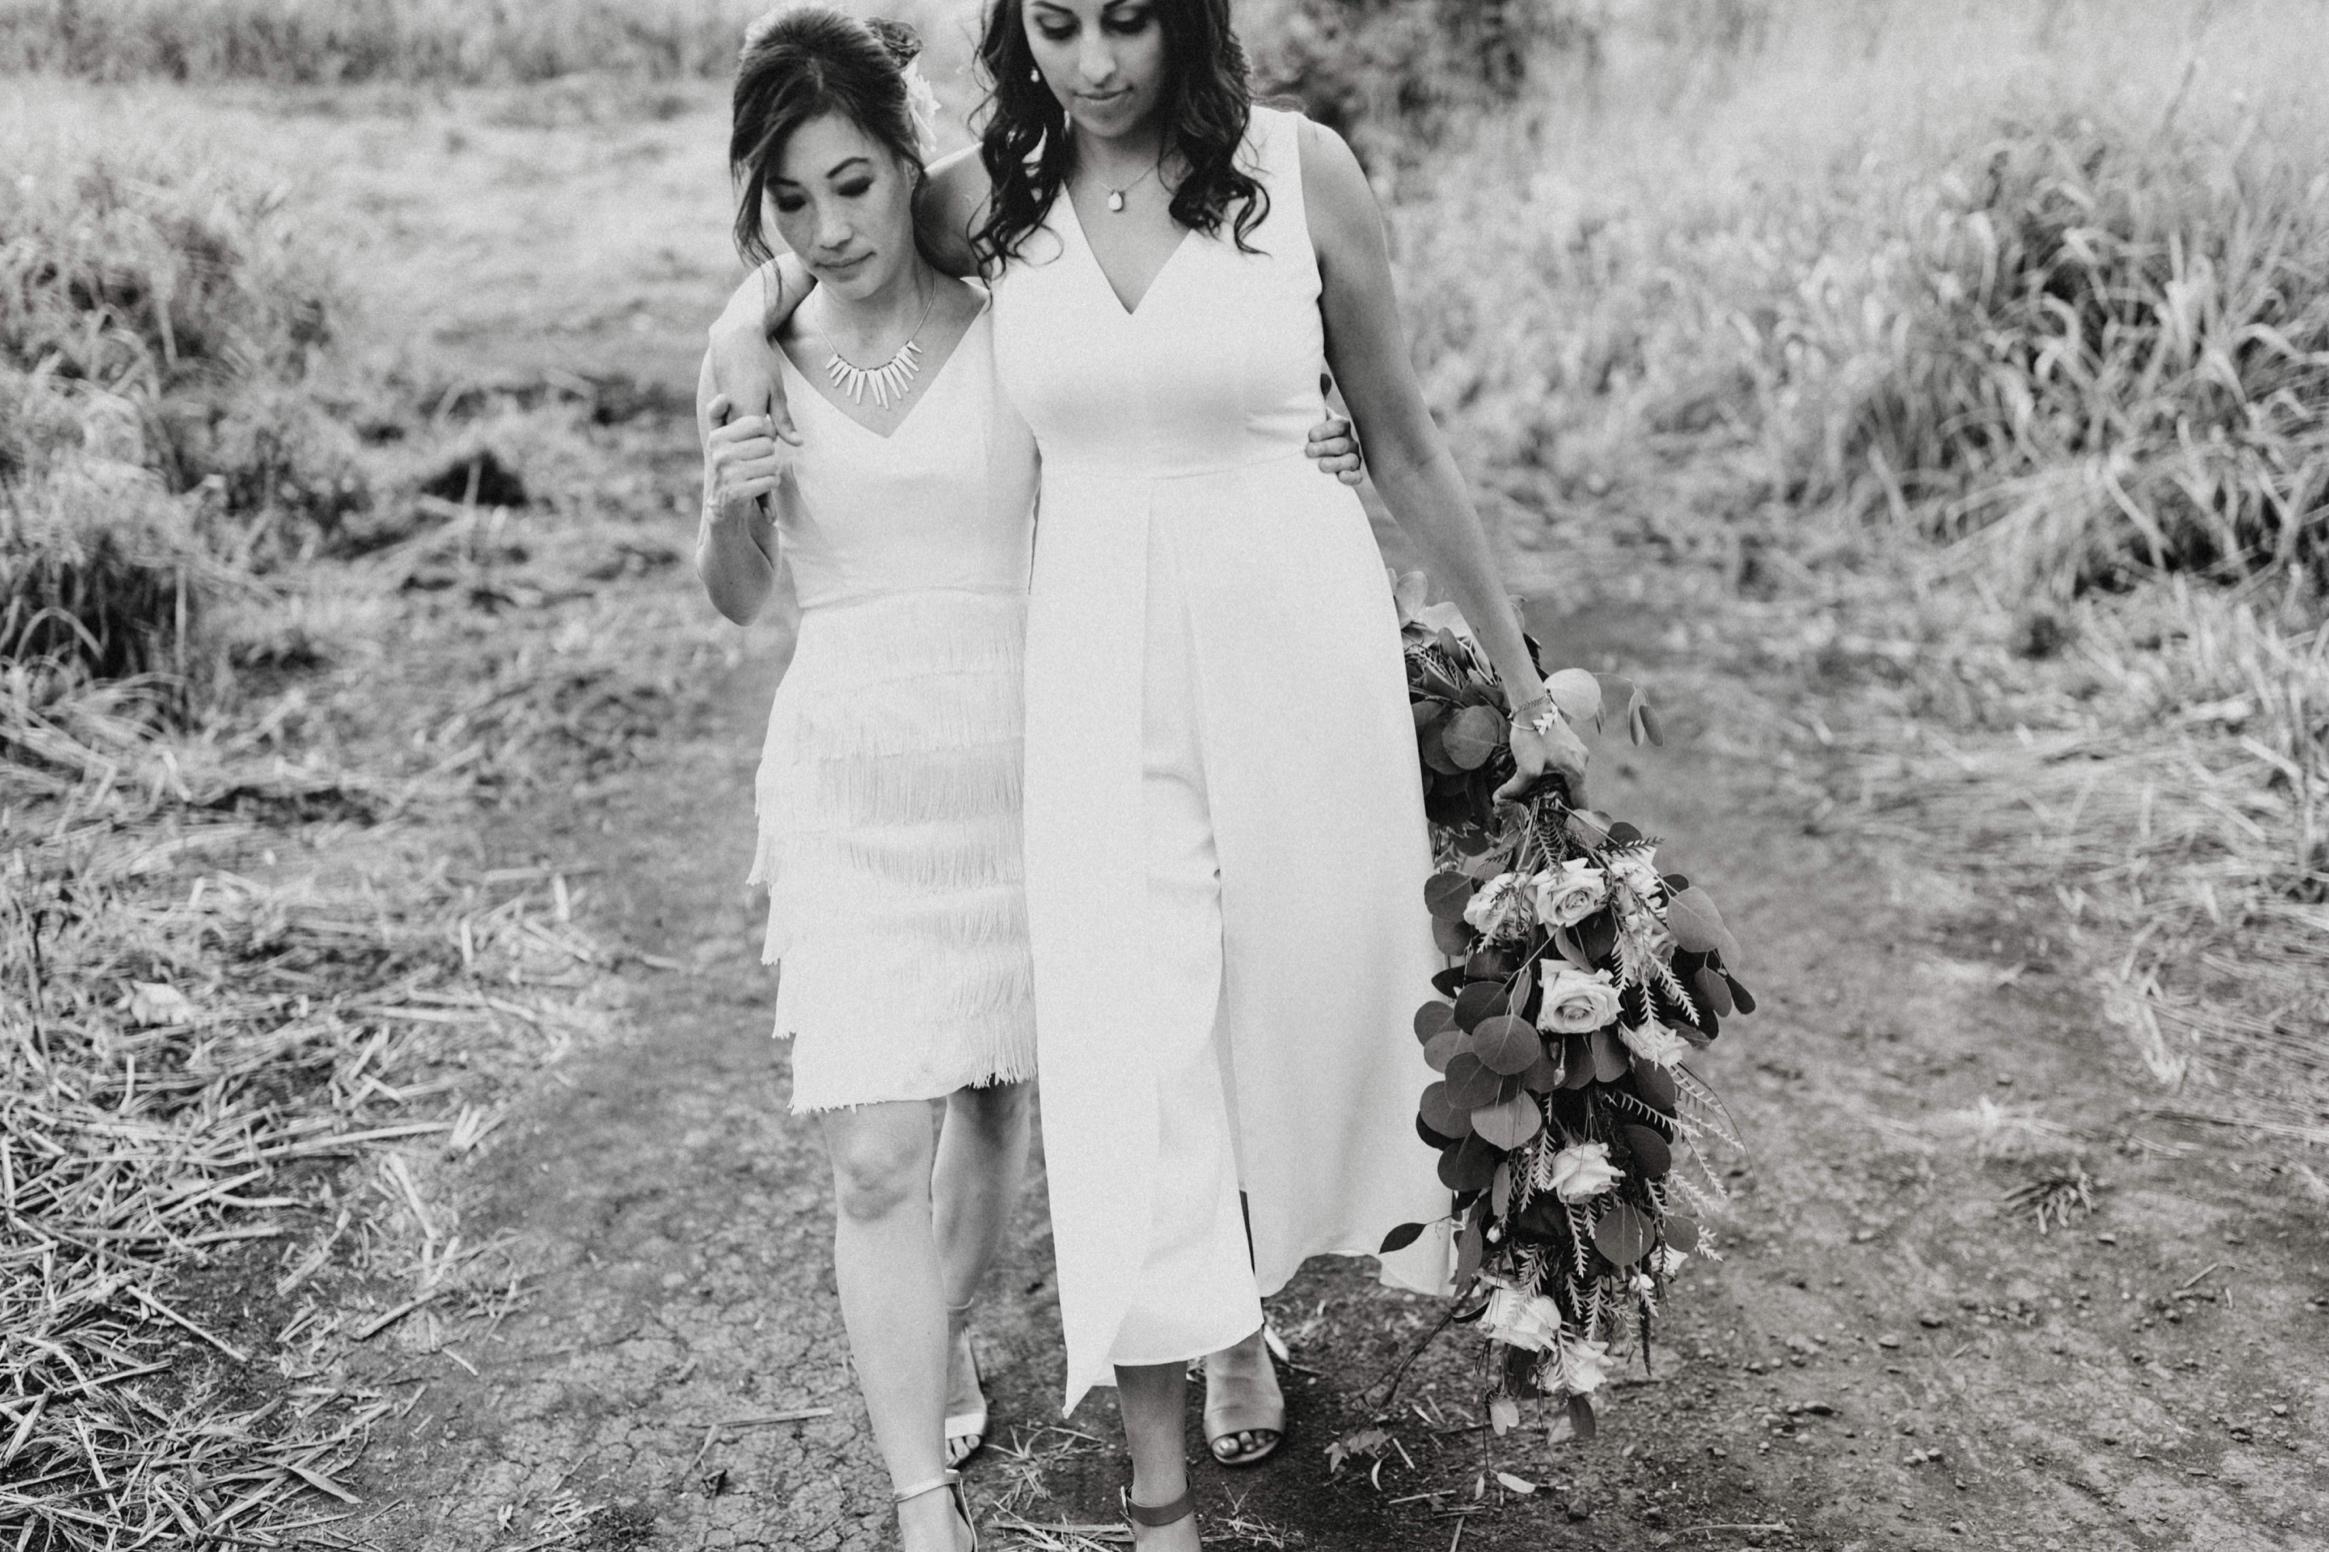 34_Oahu Hawaii Wedding  (128 of 294)_Oahu_sex_Hawaii_same_wedding_elopement_photographer.jpg